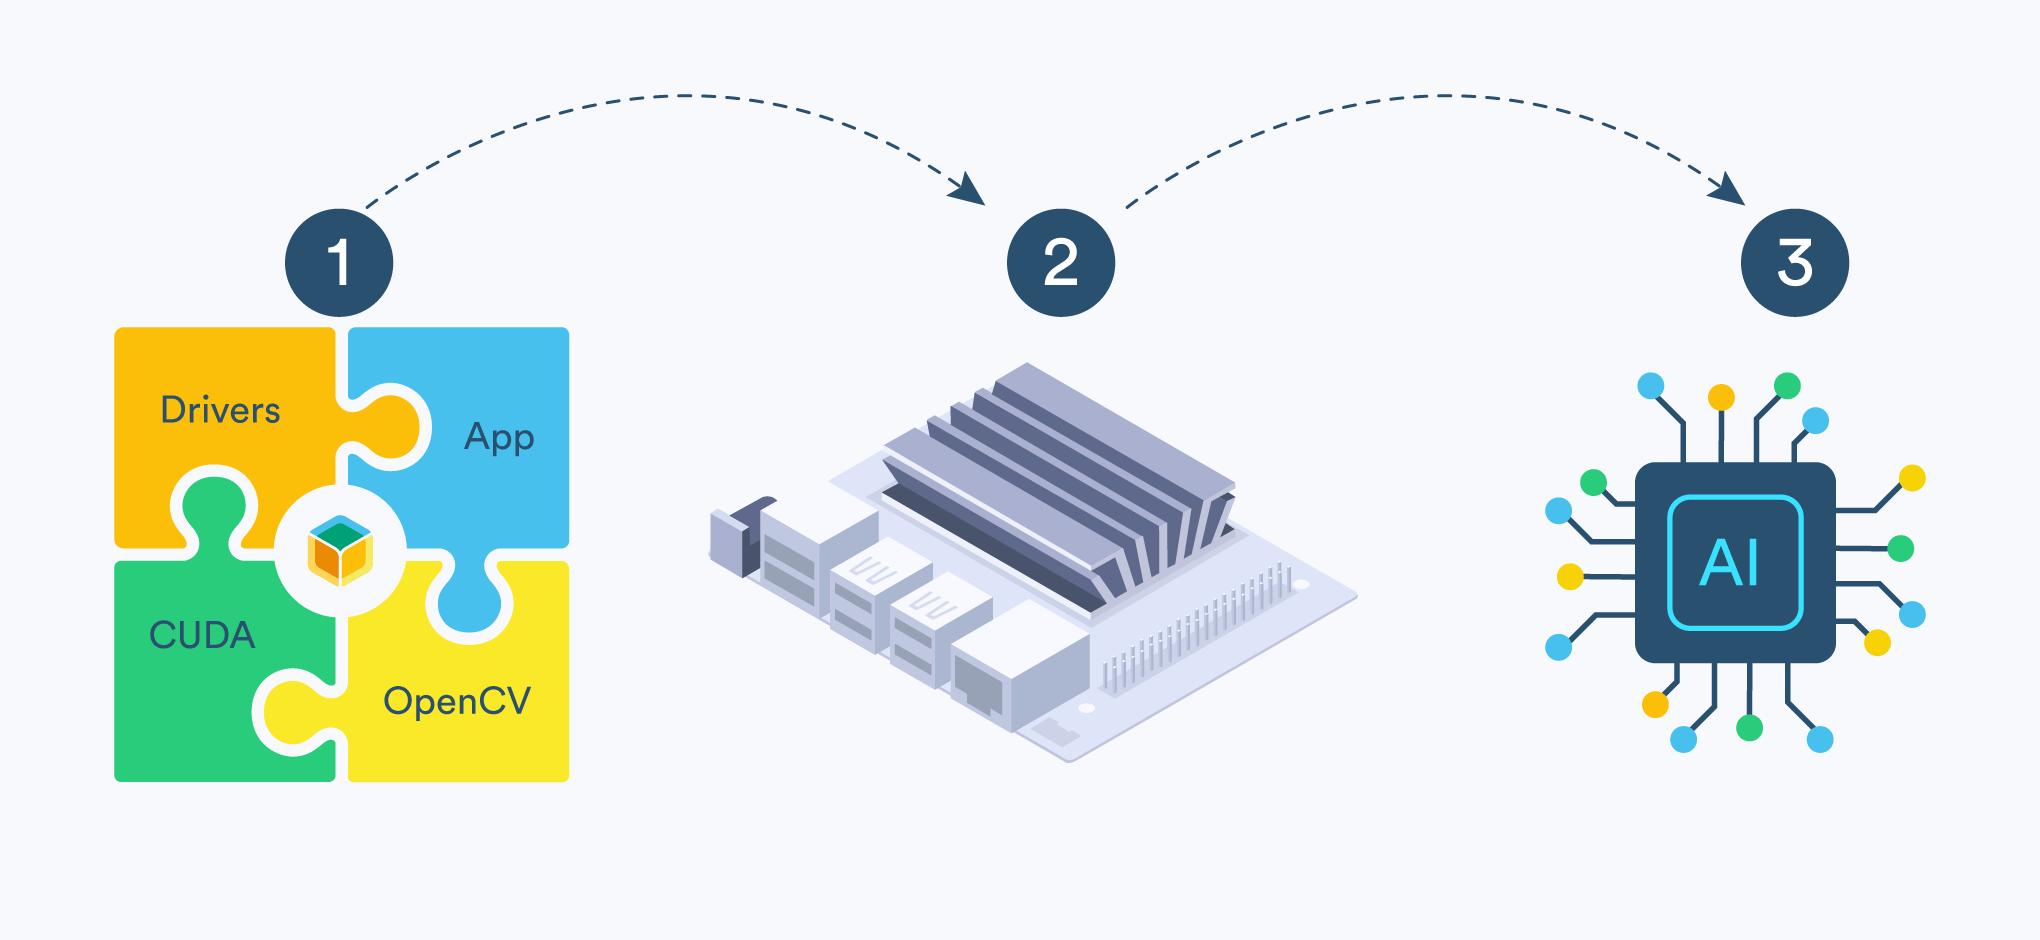 How to use edge AI tools with Nvidia and balenaOS